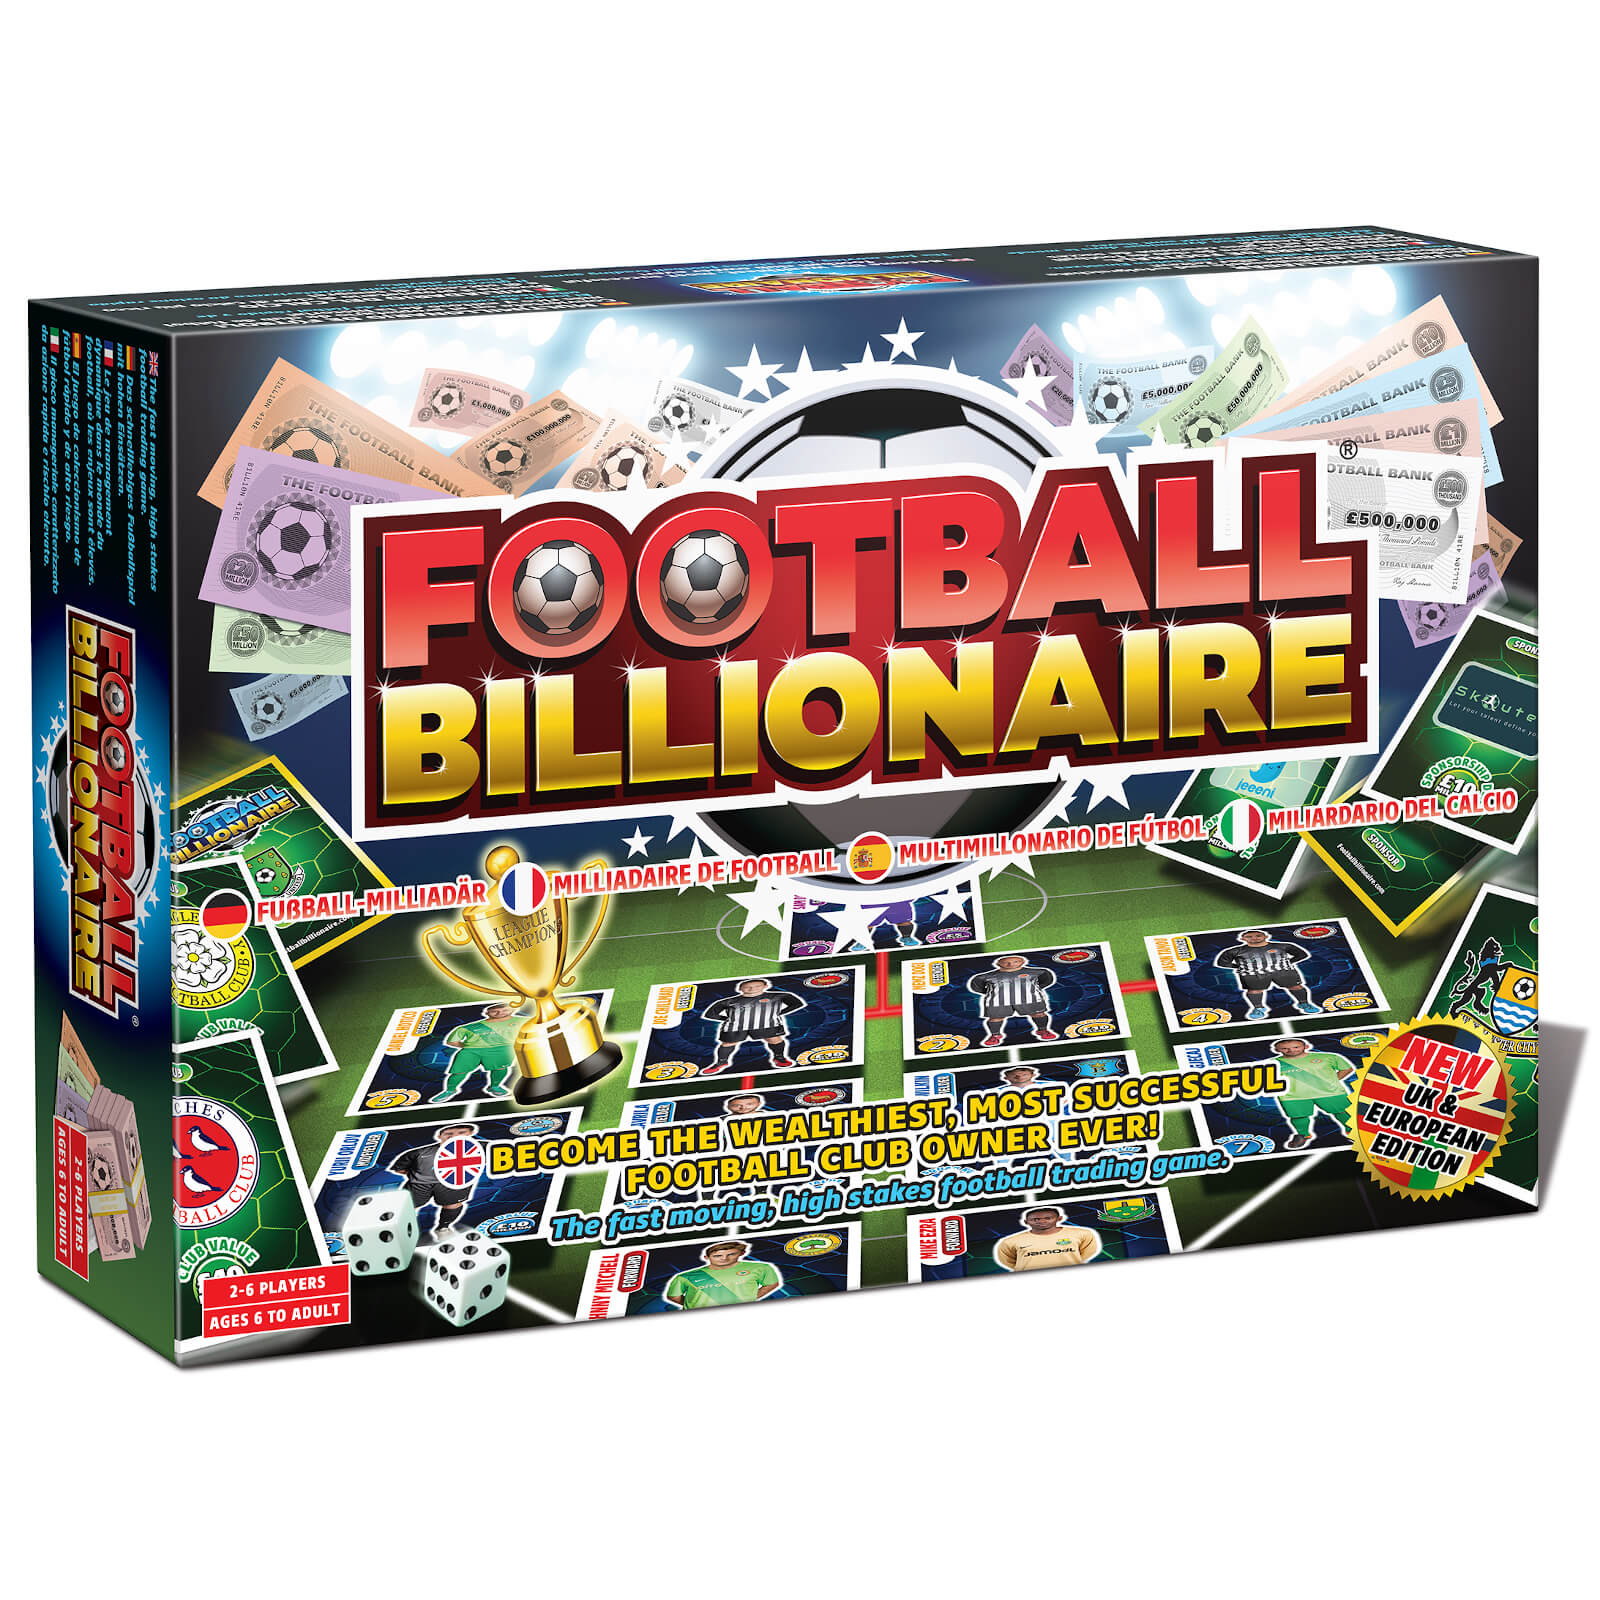 Image of Football Billionaire - Match Day Edition